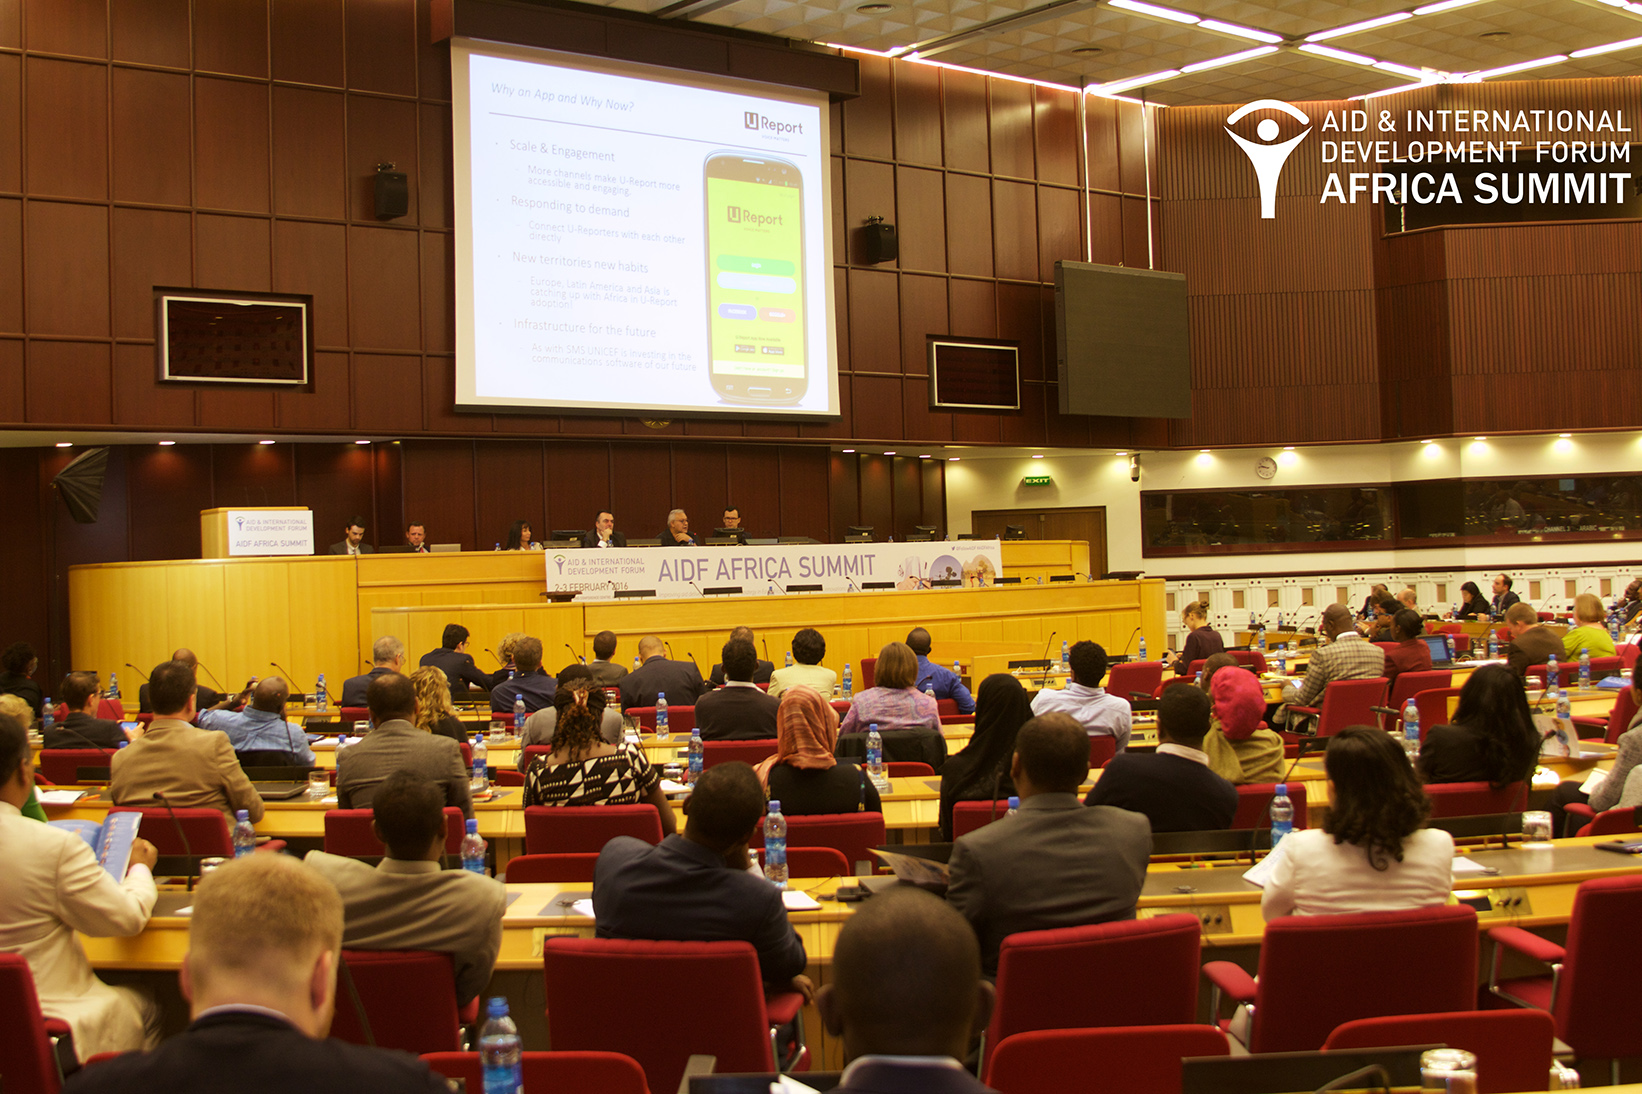 Kenya's ICT secretary to give keynote address at Aid & Development Africa Summit in Nairobi